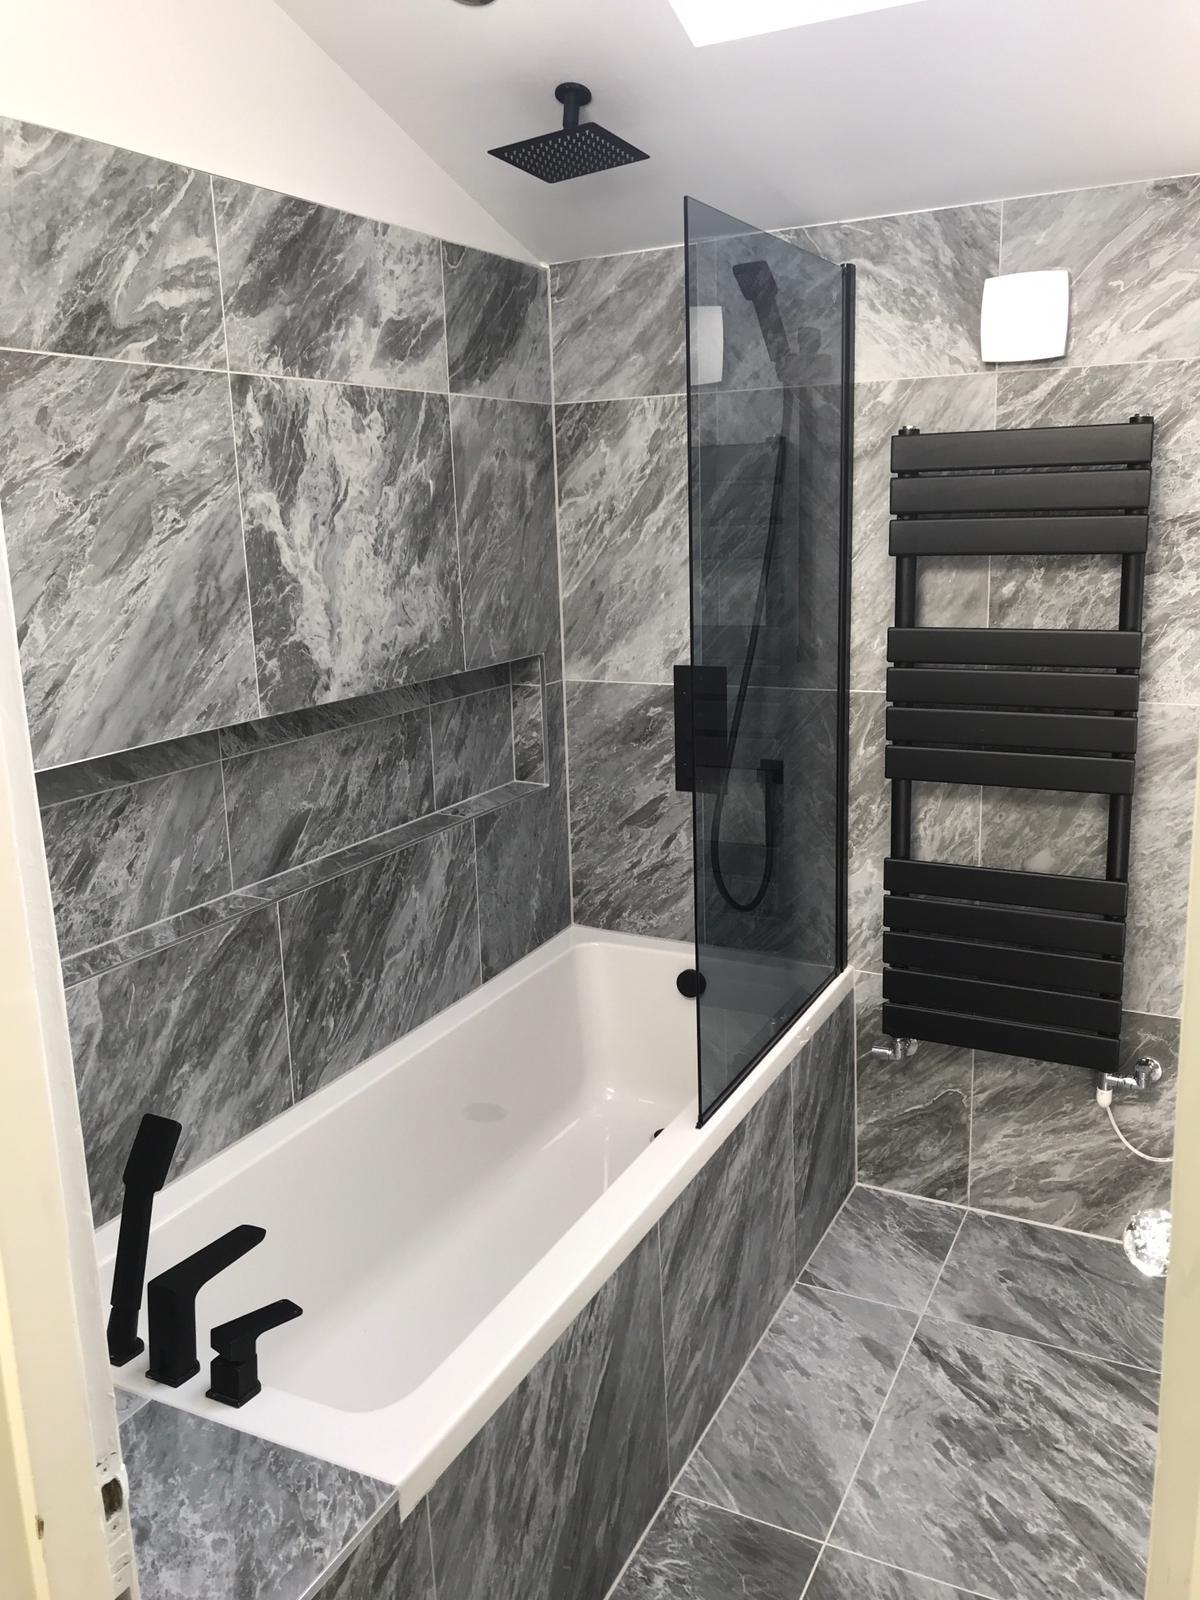 Complete bathroom redesign